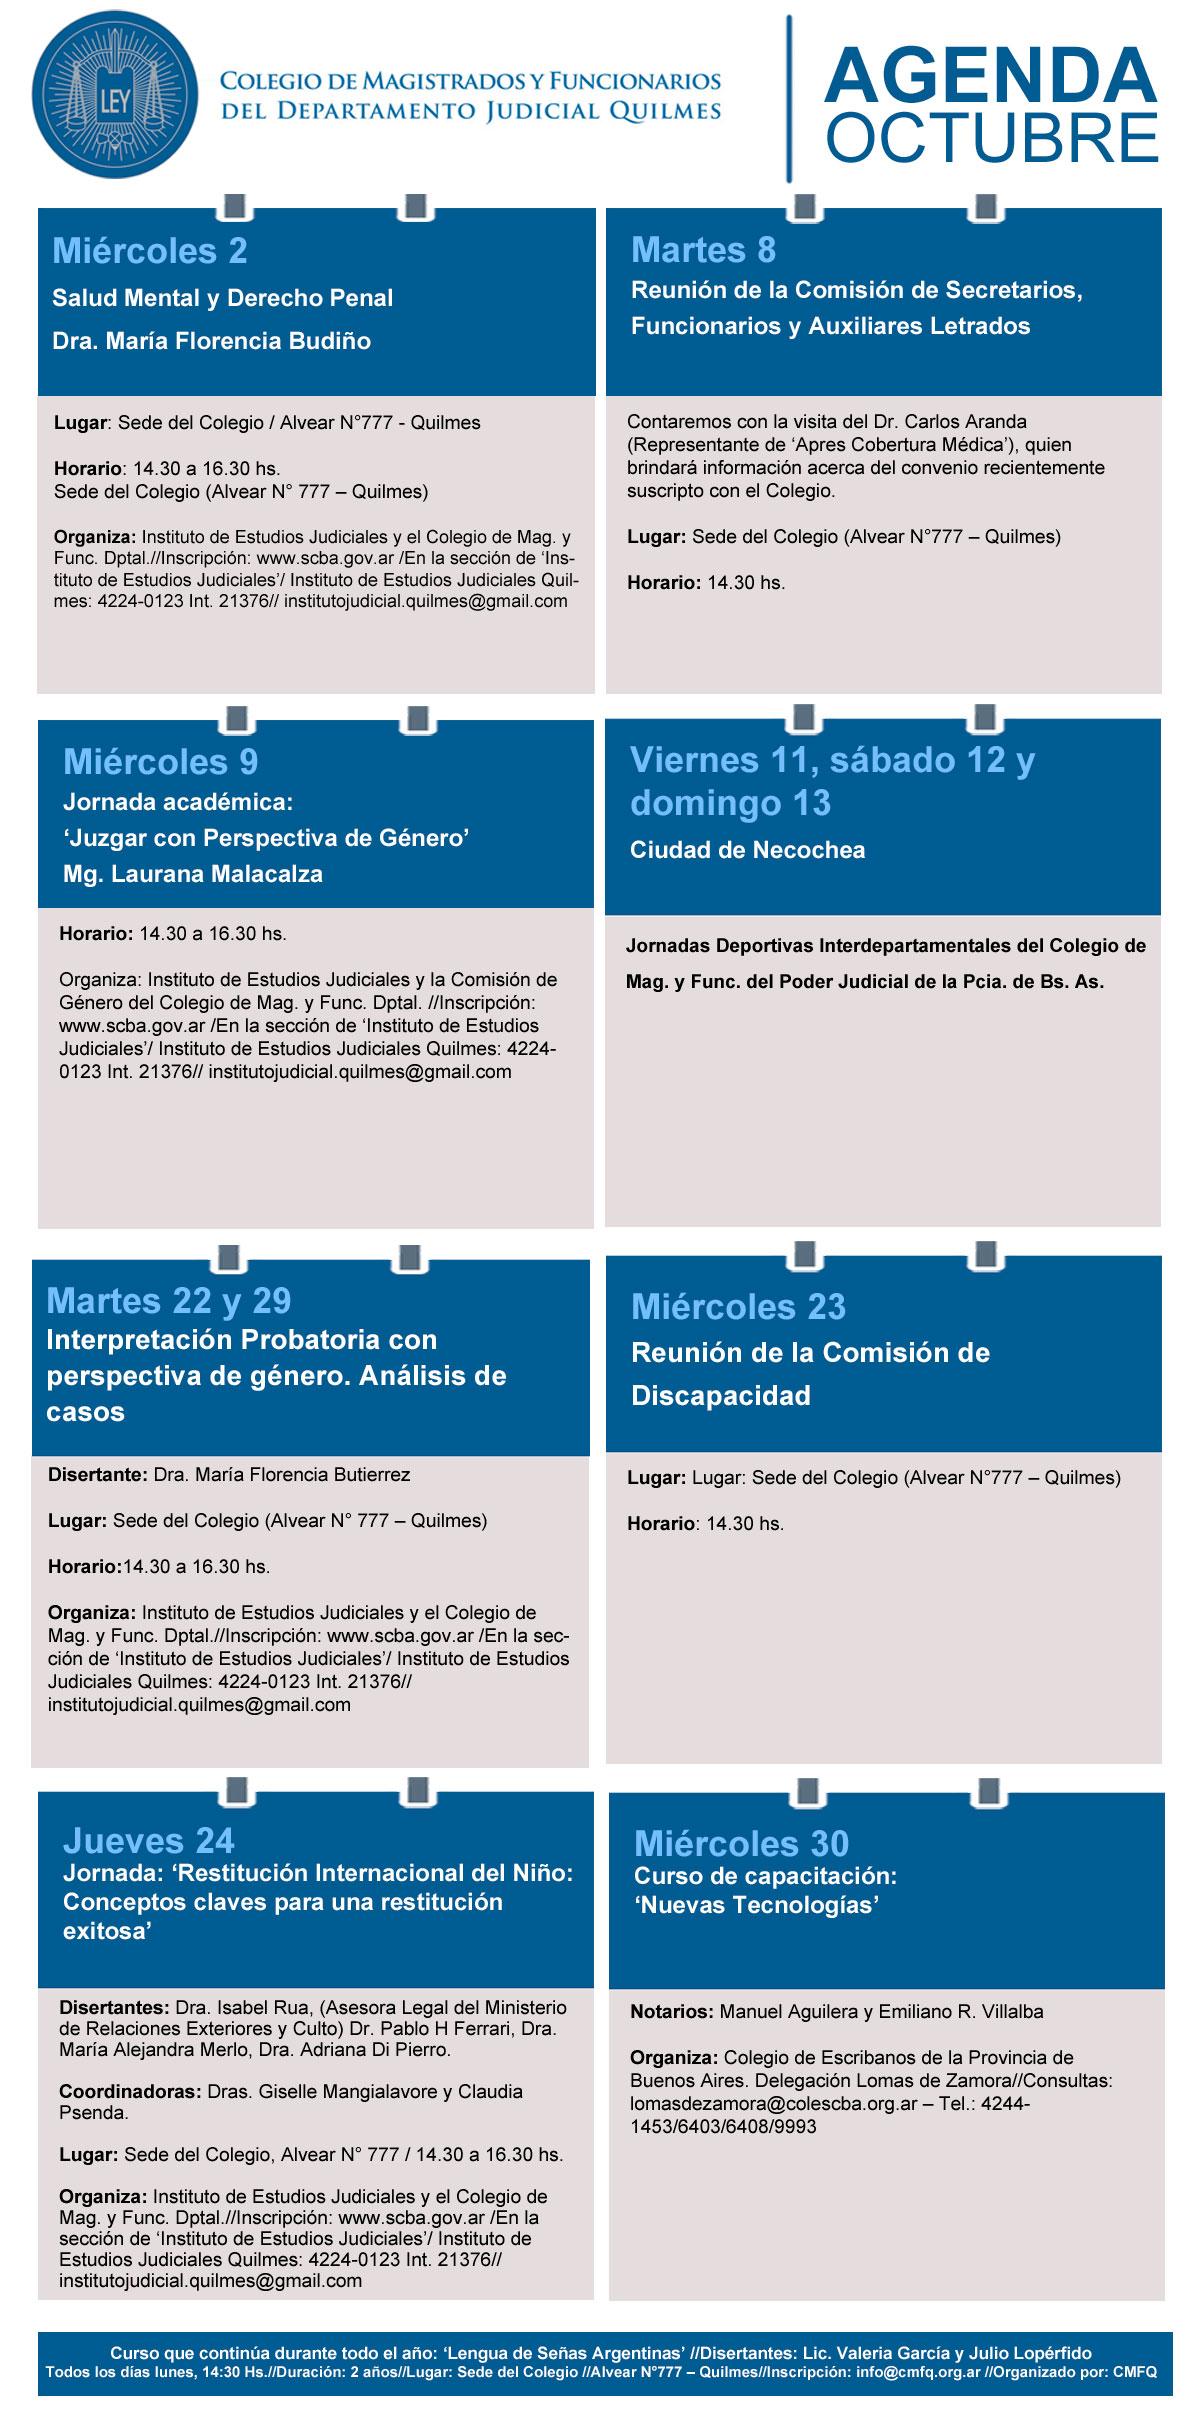 Agenda de actividades//Octubre